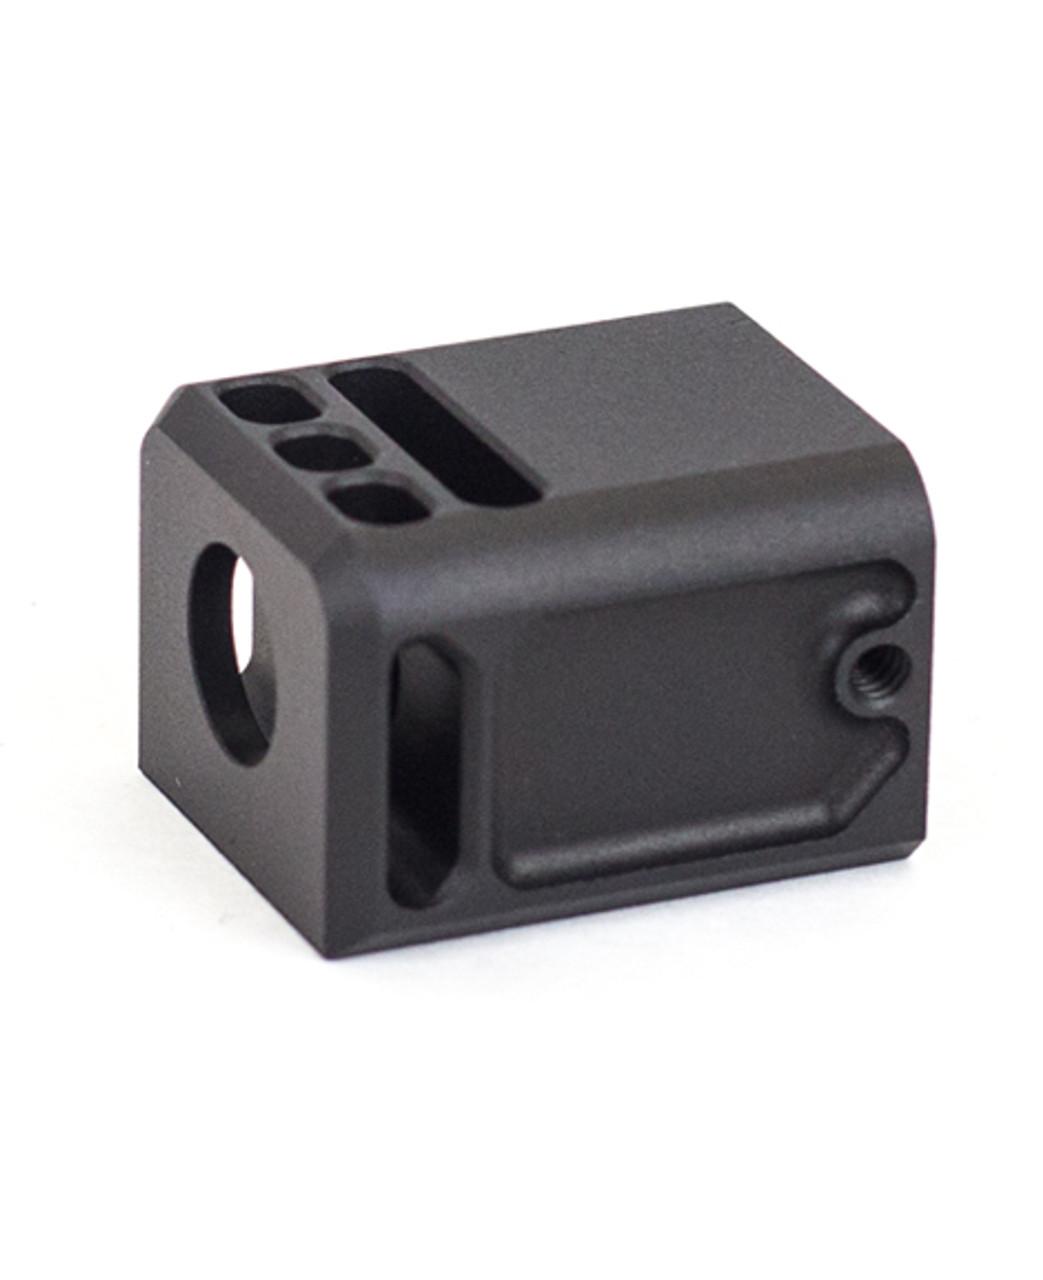 TBRCi Glock Micro Comp V3 Alum 9mm